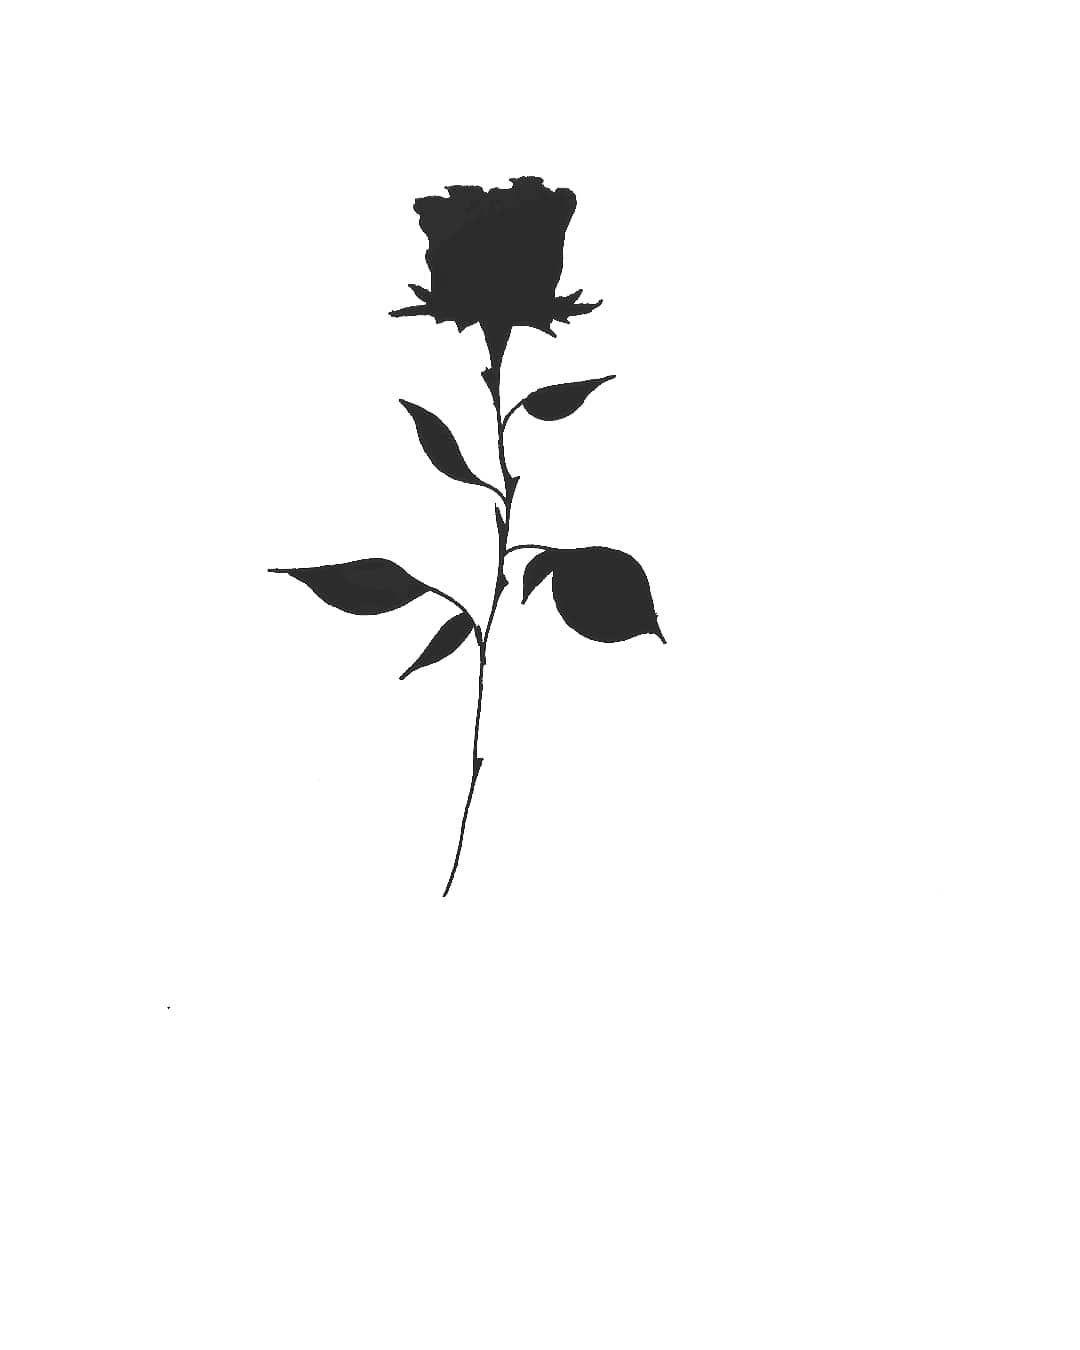 Rosa Negra Ya Reservada Ink Inked Tattoo Tatuagens De Rosas Negras Tatuagem De Coruja Pequena Tatuagens Aleatorias